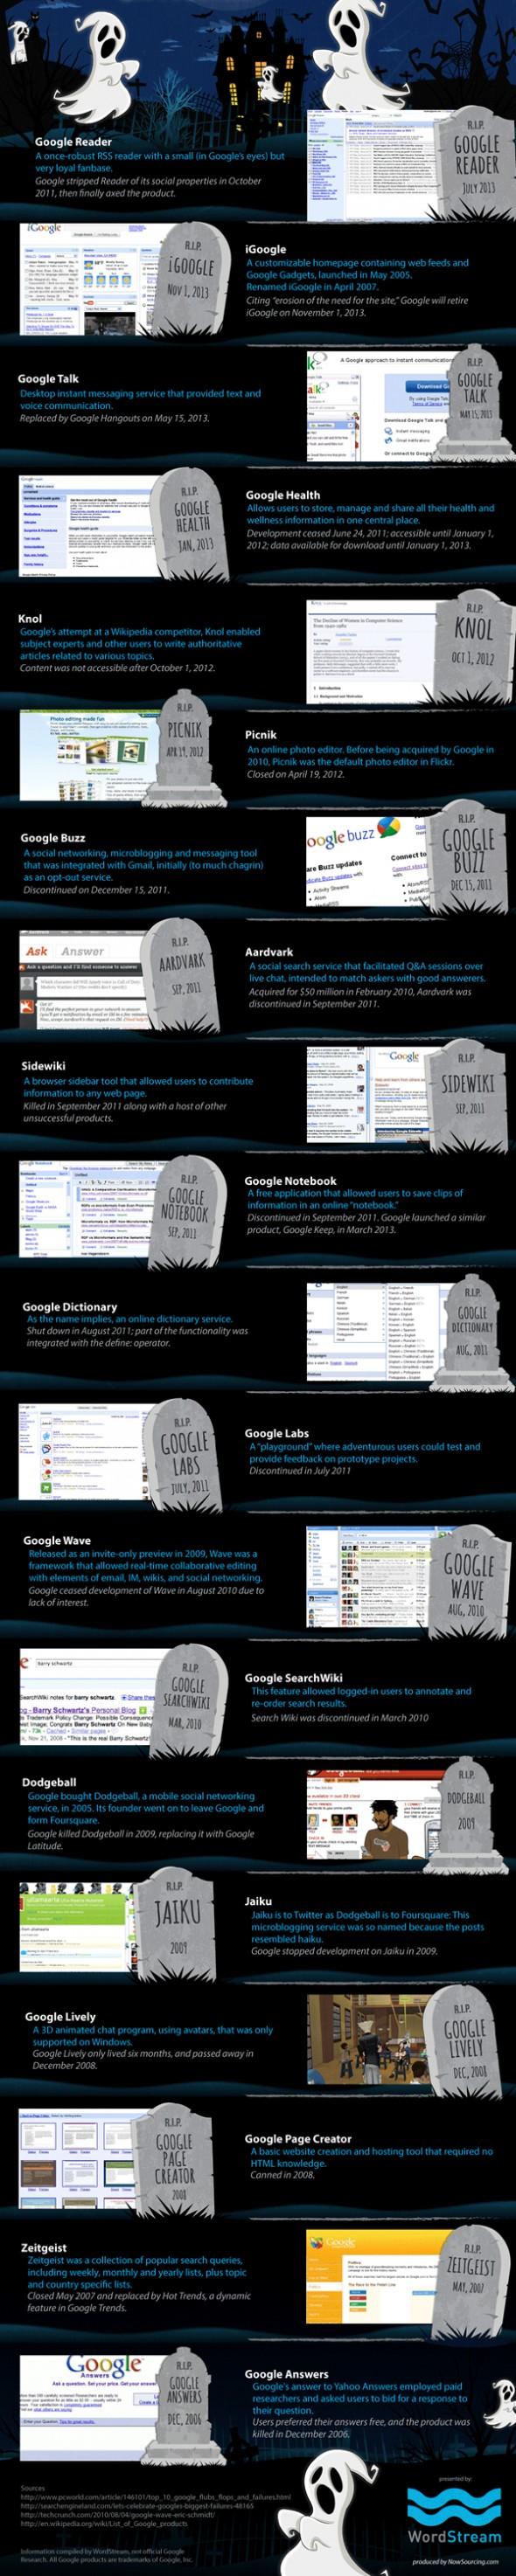 google-graveyard-2-590x2948 (1)